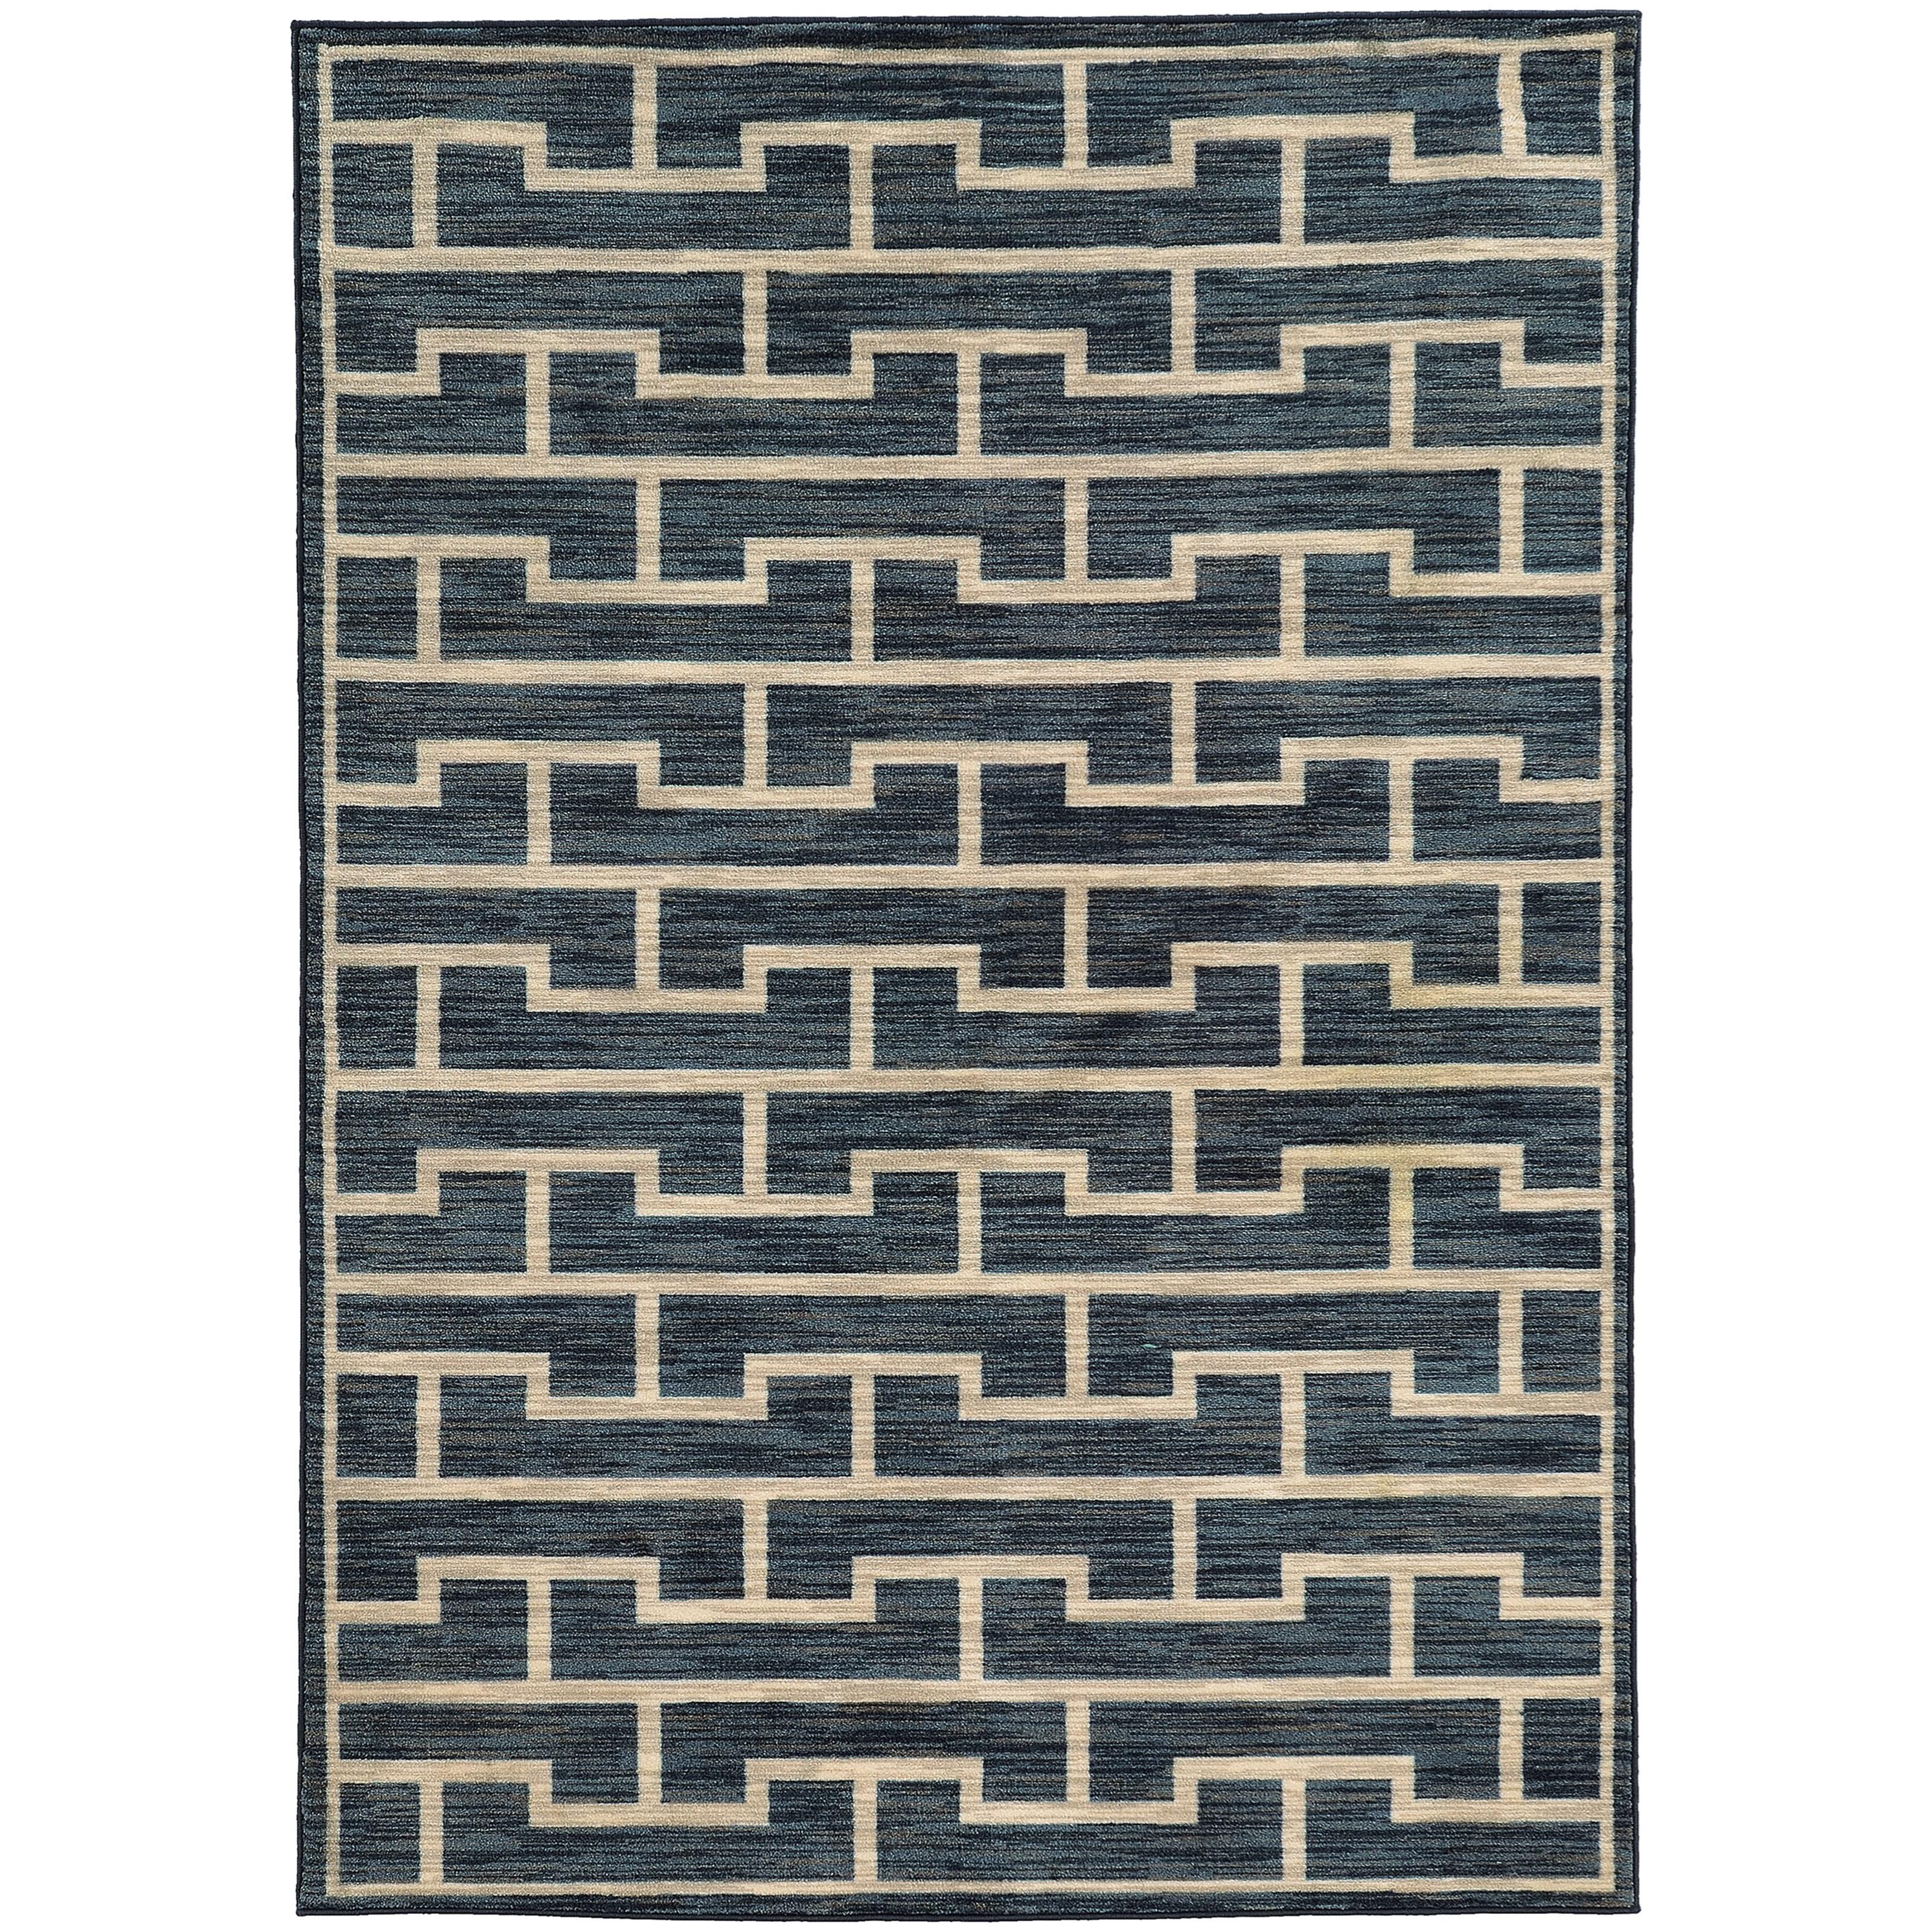 "Oriental Weavers Harper 7'10"" X 10'10"" Rectangle Area Rug - Item Number: HAR46177710X1010"